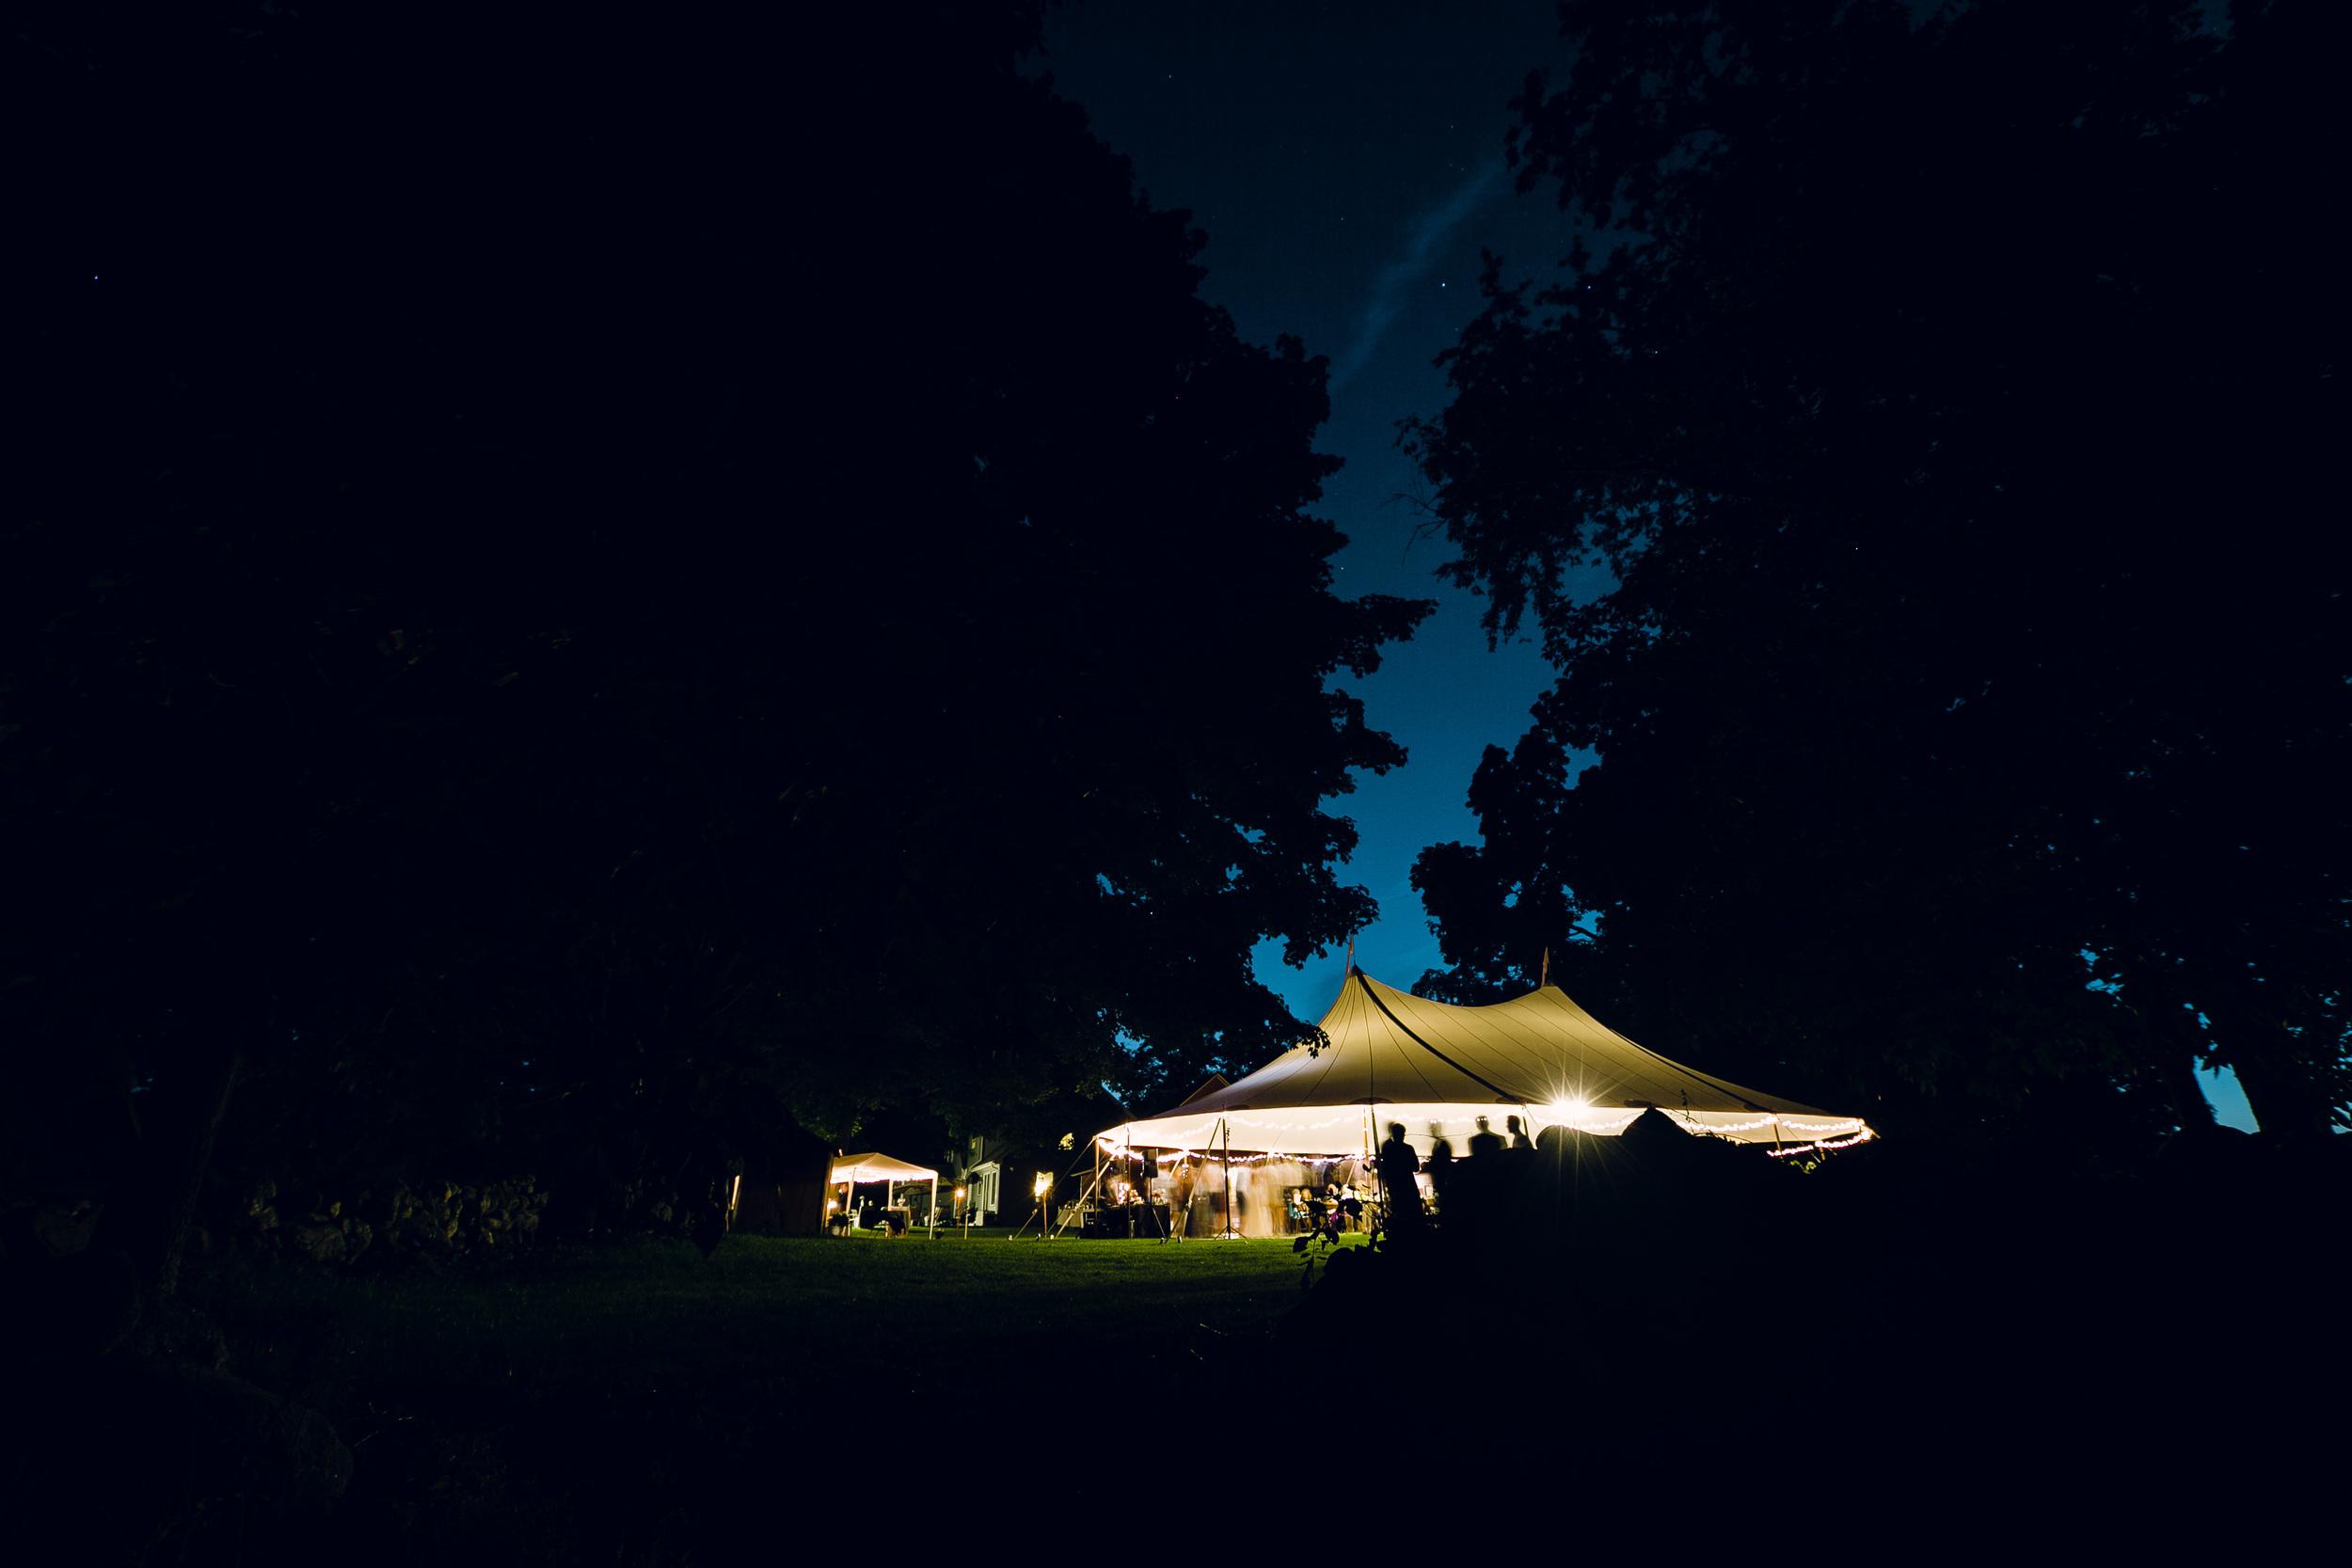 Rustic-Country-Style-Wedding-Connecticut-Farm-Photojornalistic-Wedding-Photography-by-Jacek-Dolata-15.jpg